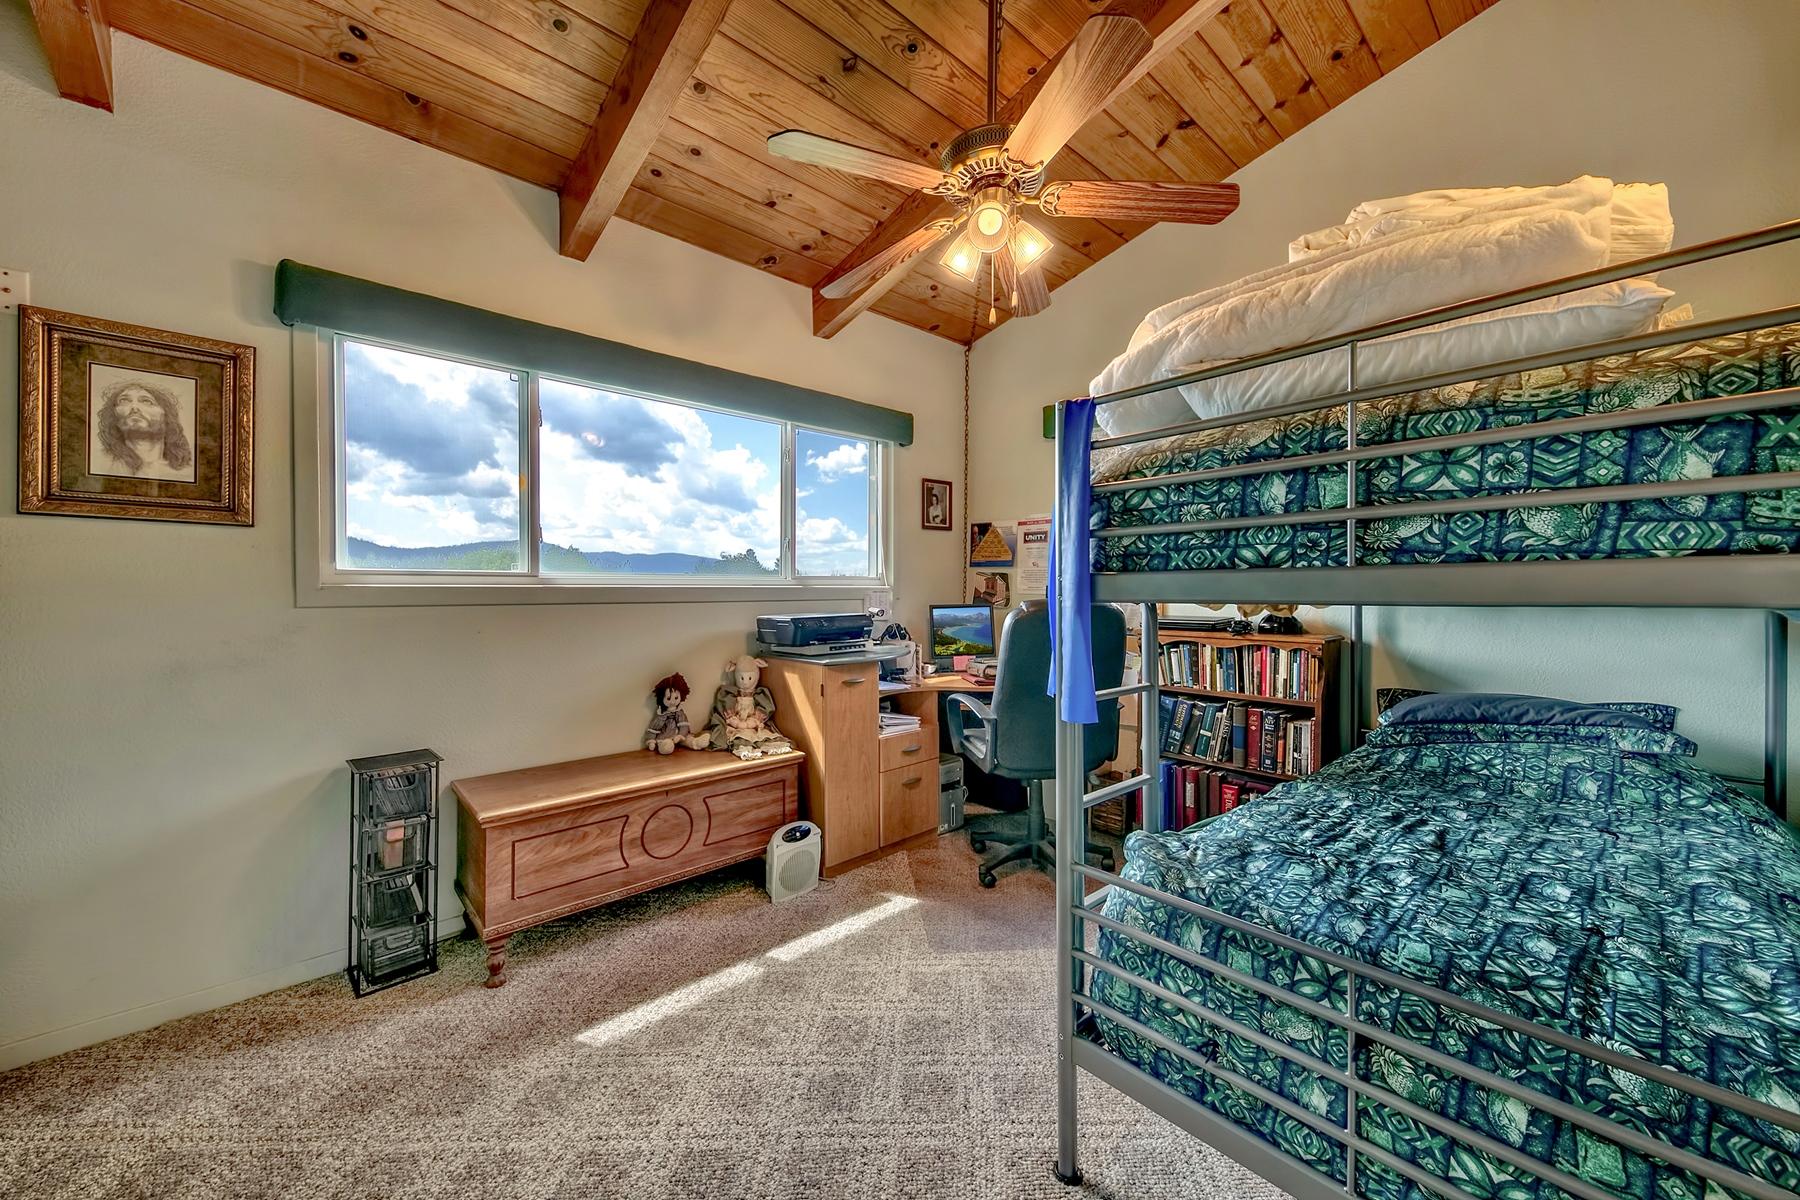 Additional photo for property listing at 433 S Lincoln St, Sierraville, CA 96126 433 S Lincoln St. Sierraville, California 96126 Estados Unidos